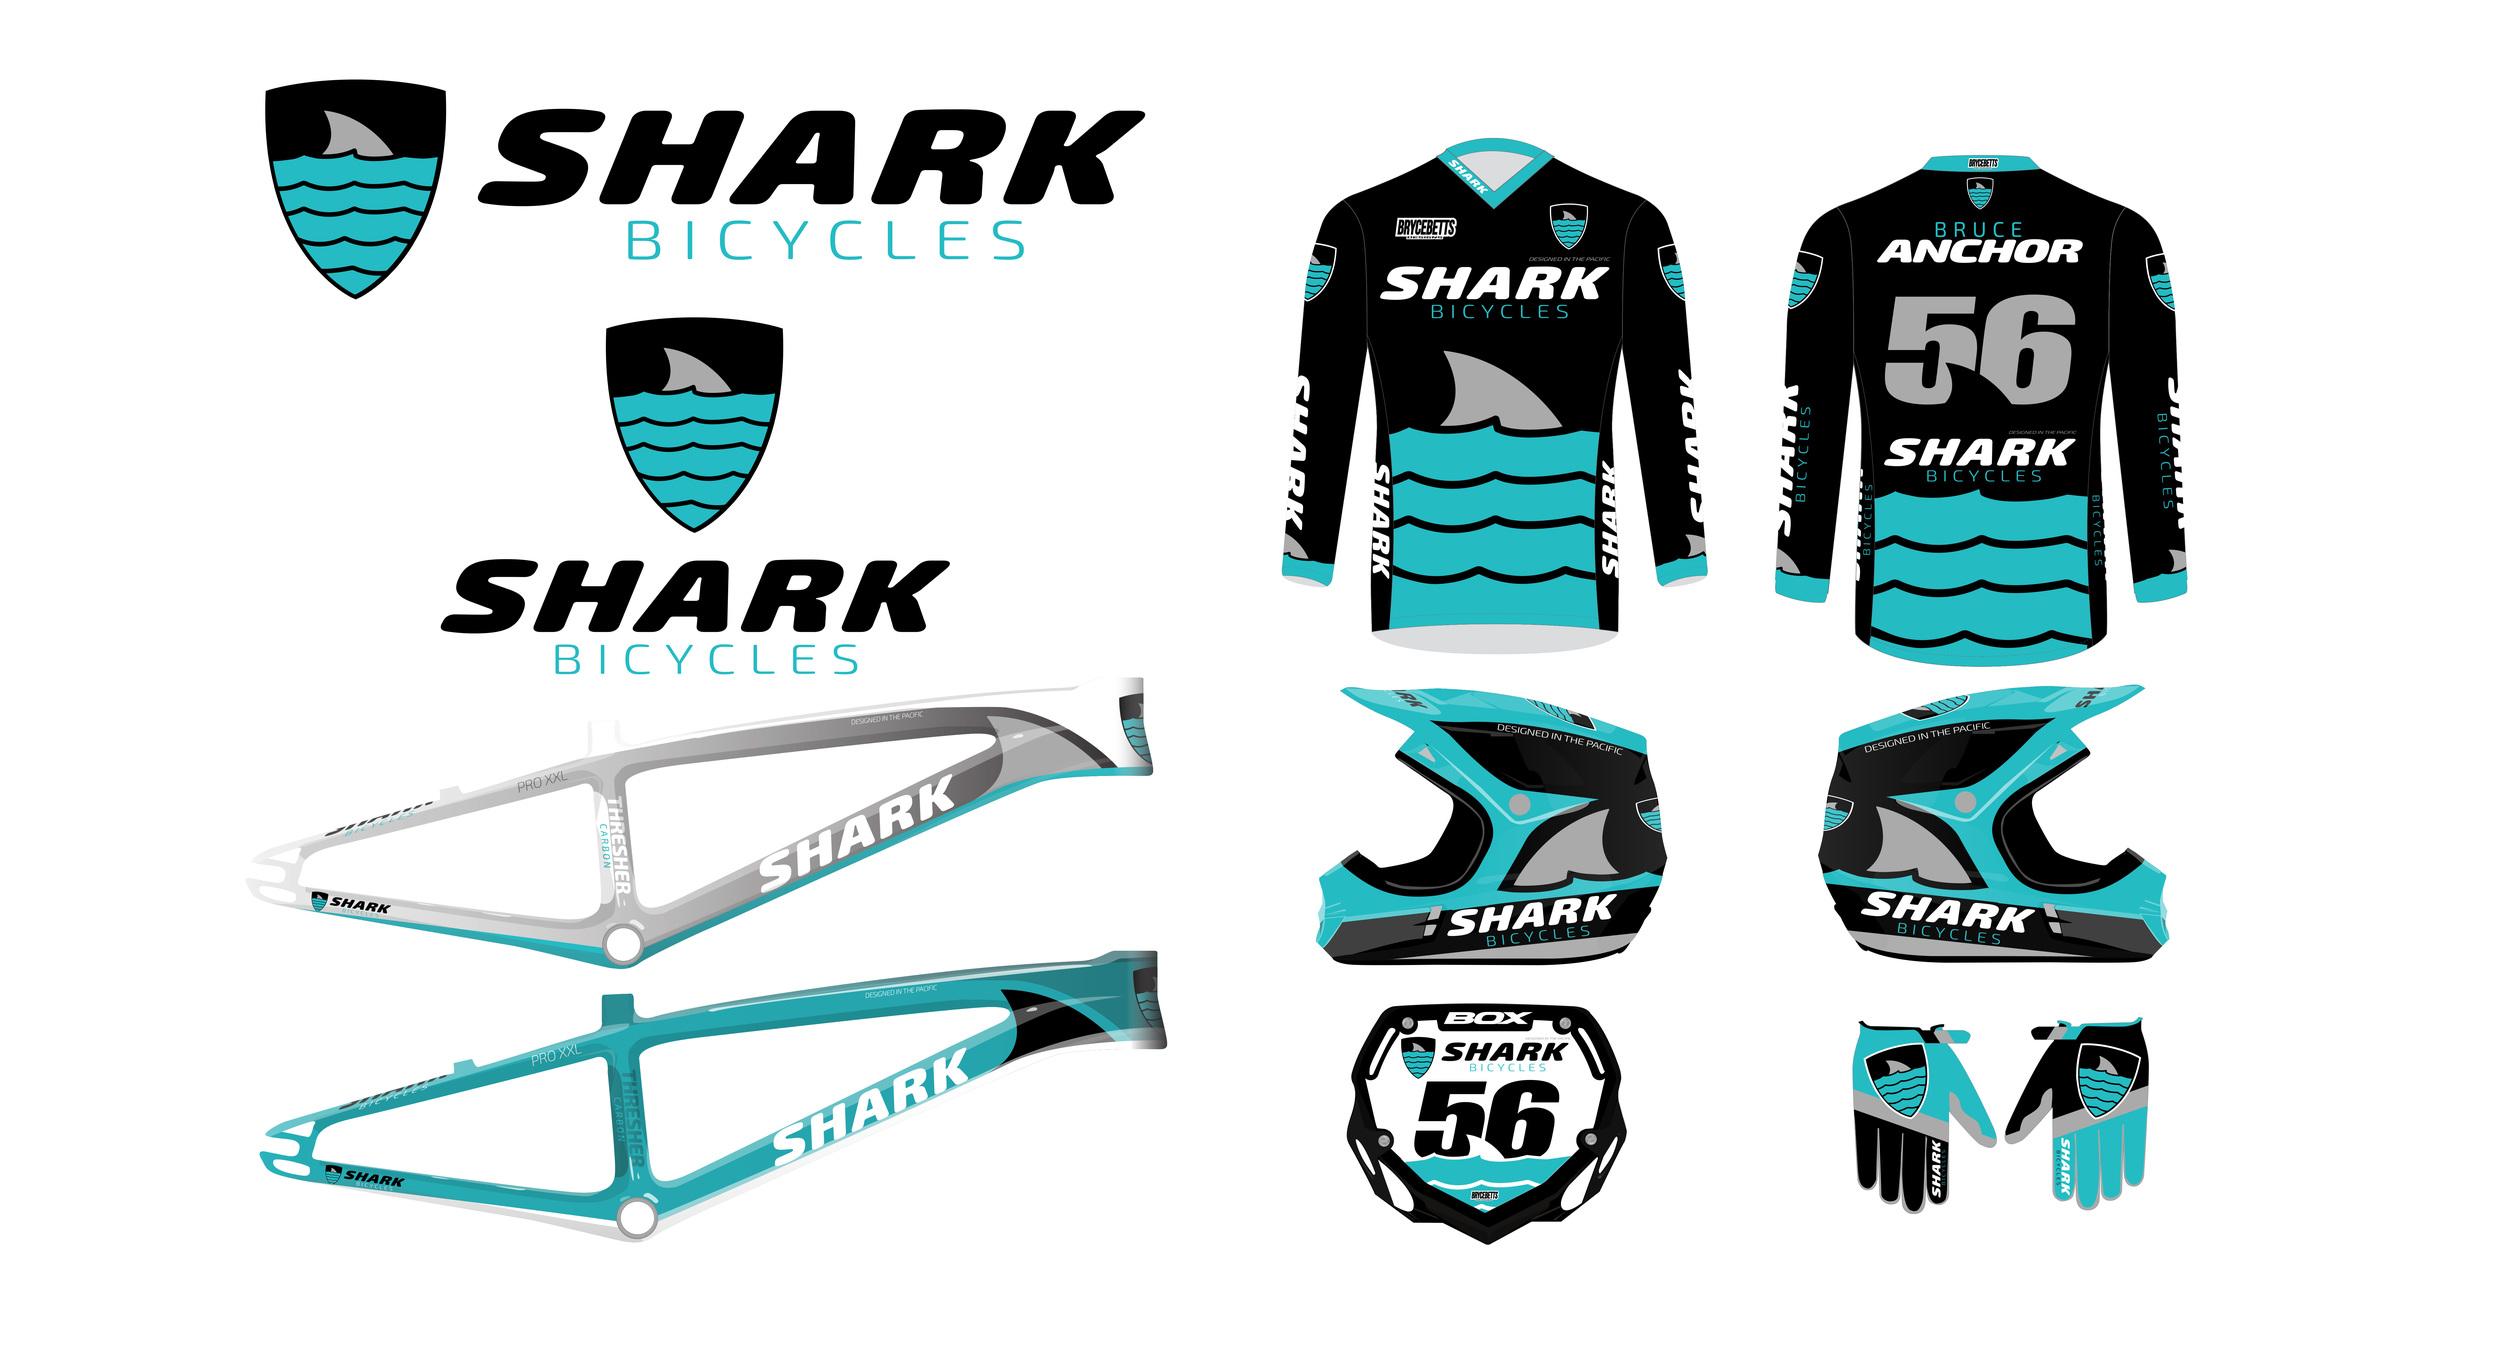 Shark Bicycles